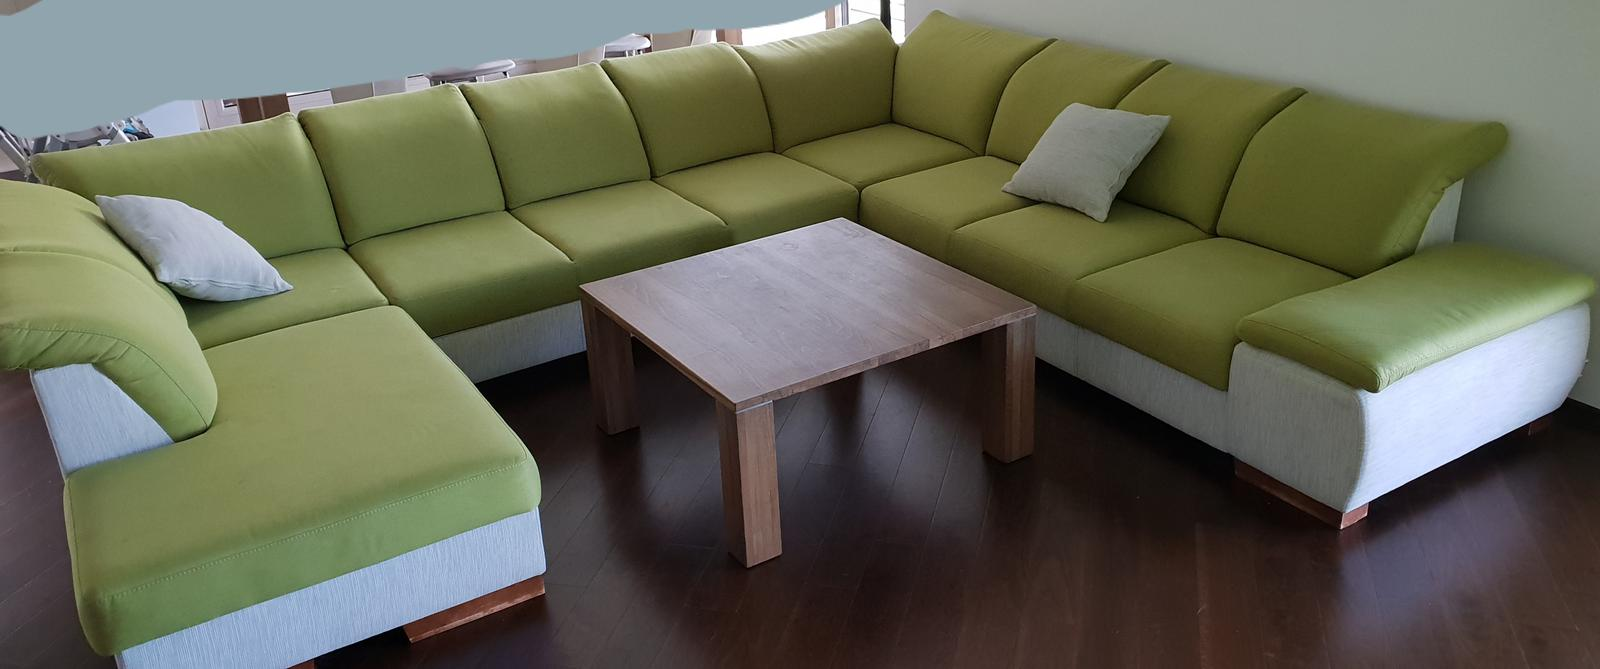 rozkladacia sedacka Milenium sipos - Obrázok č. 2